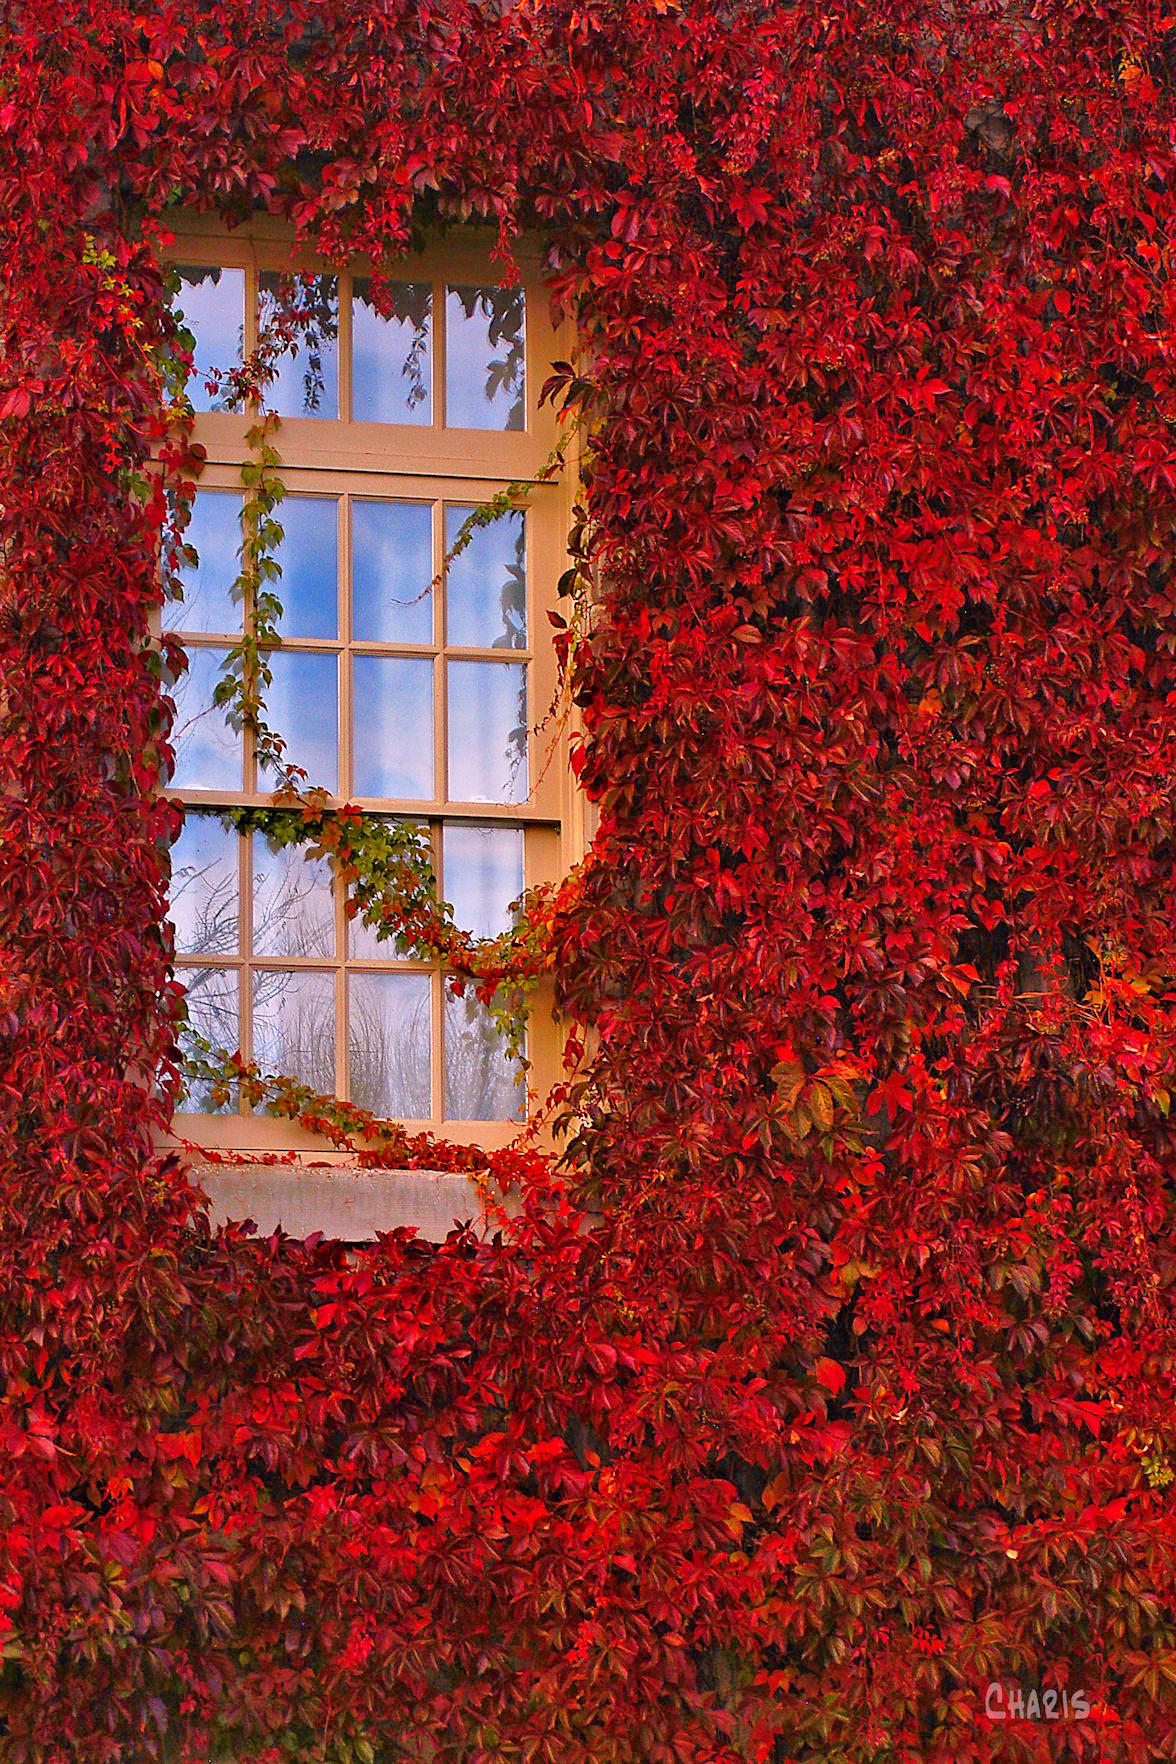 Mission window autumn virginai creeper vine ch rs bright DSC_0292